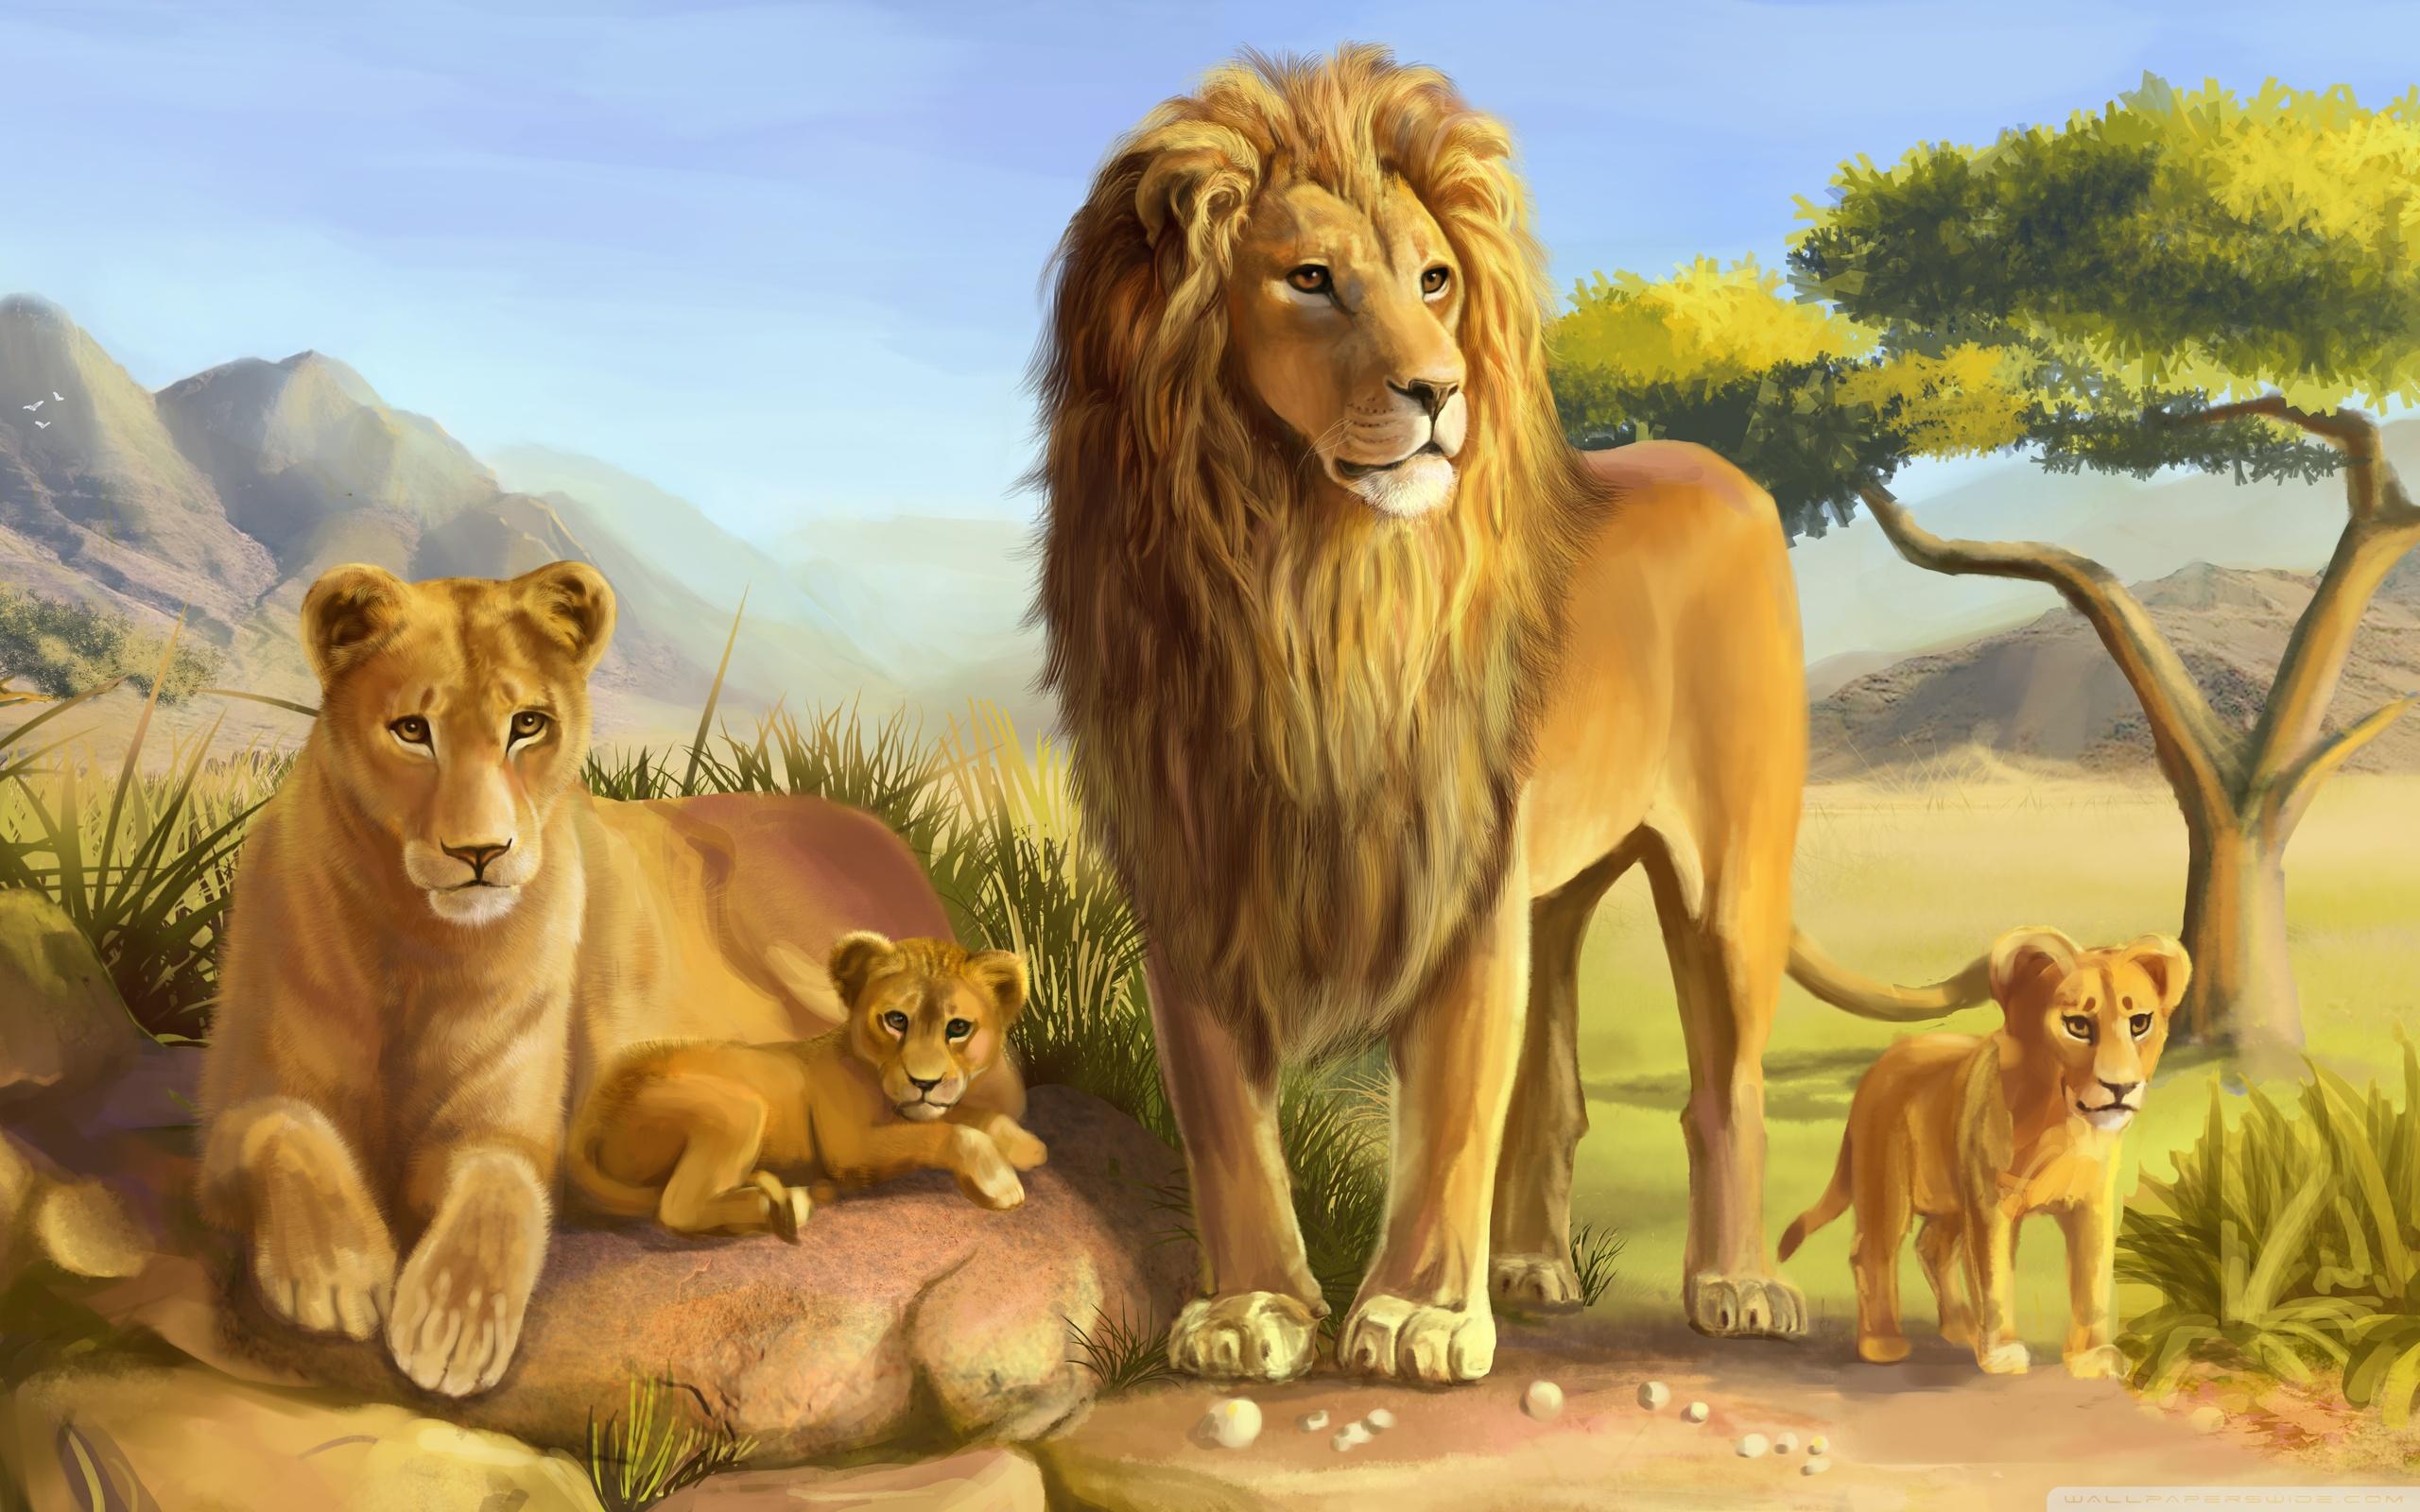 Lion Family ❤ 4K HD Desktop Wallpaper for 4K Ultra HD TV • Tablet ...